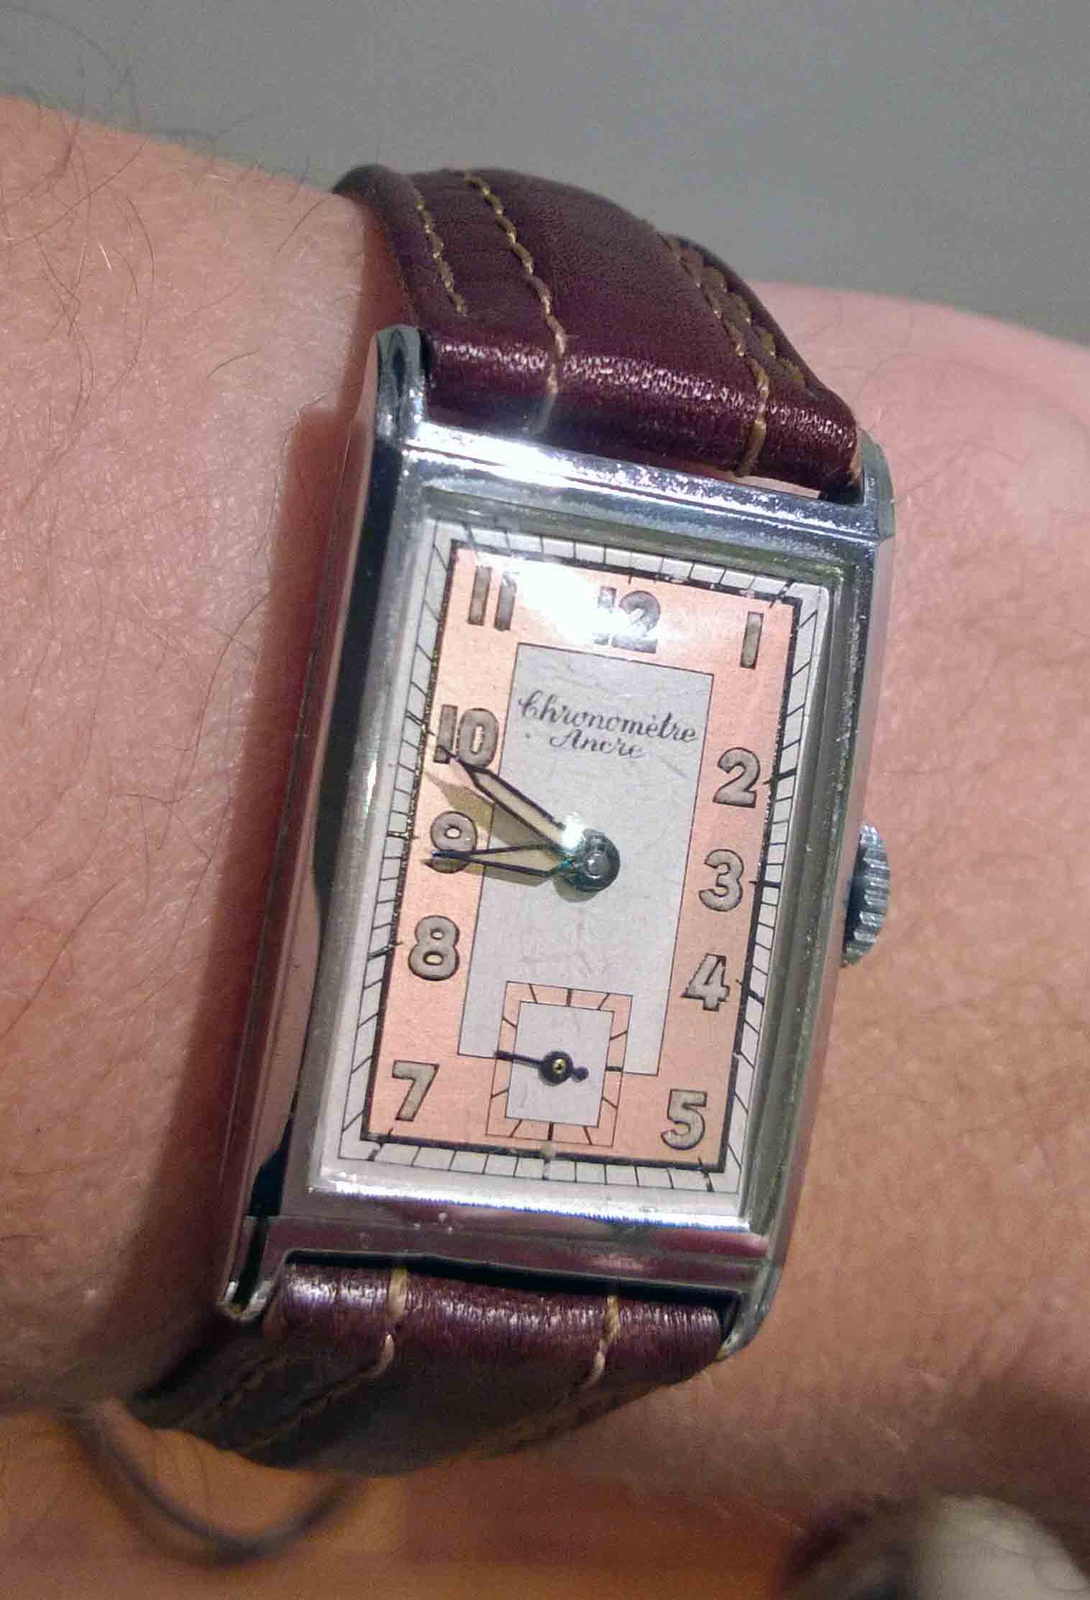 chronometre-ancre-weiss.jpg